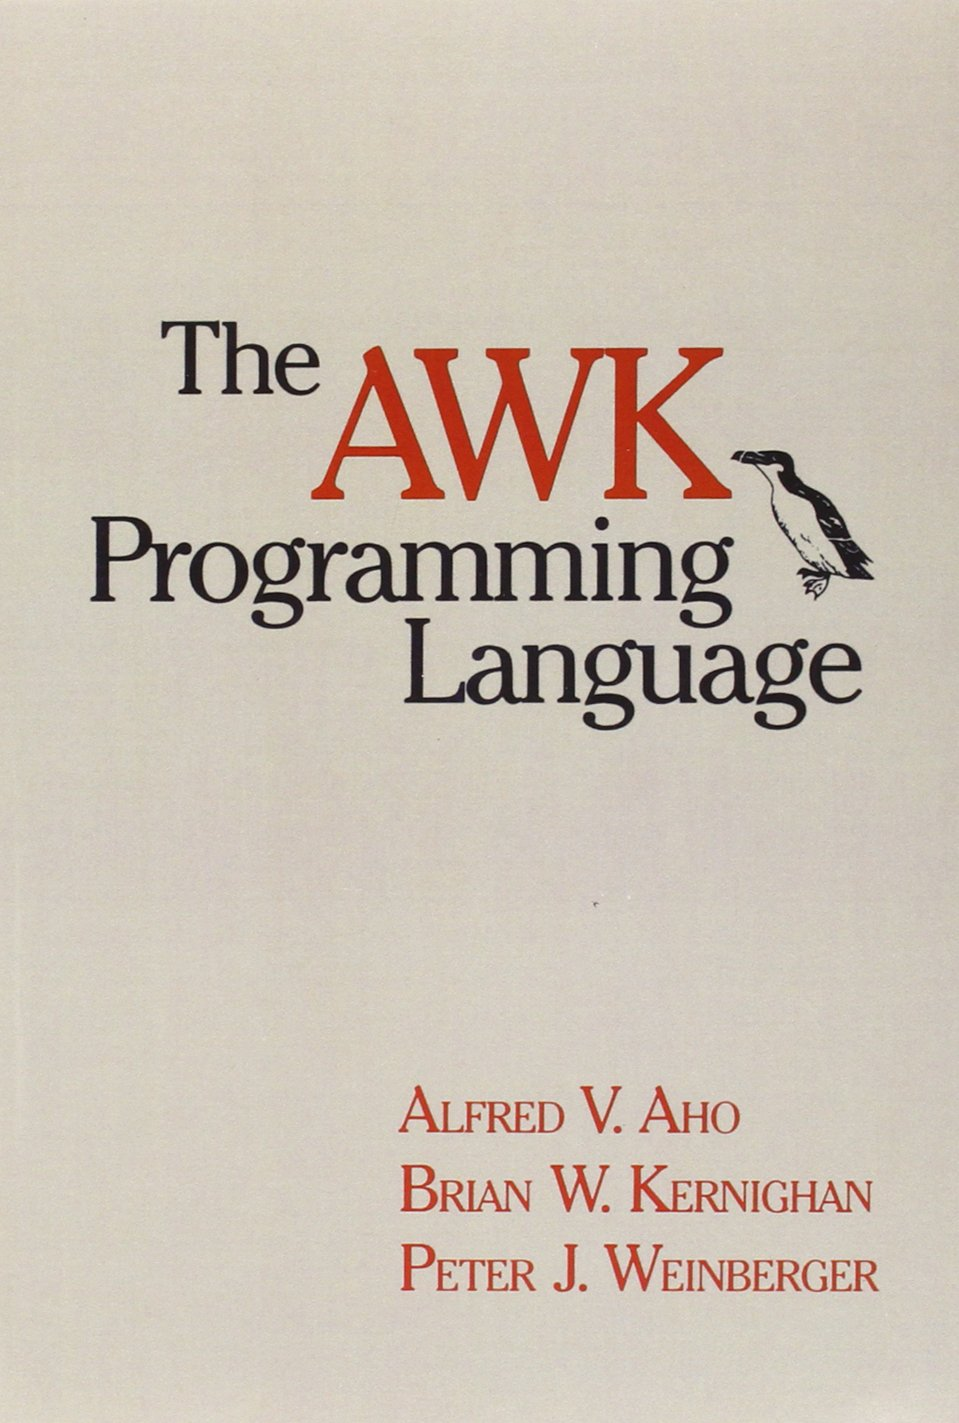 THE AWK PROGRAMMING LANGUAGE EBOOK DOWNLOAD